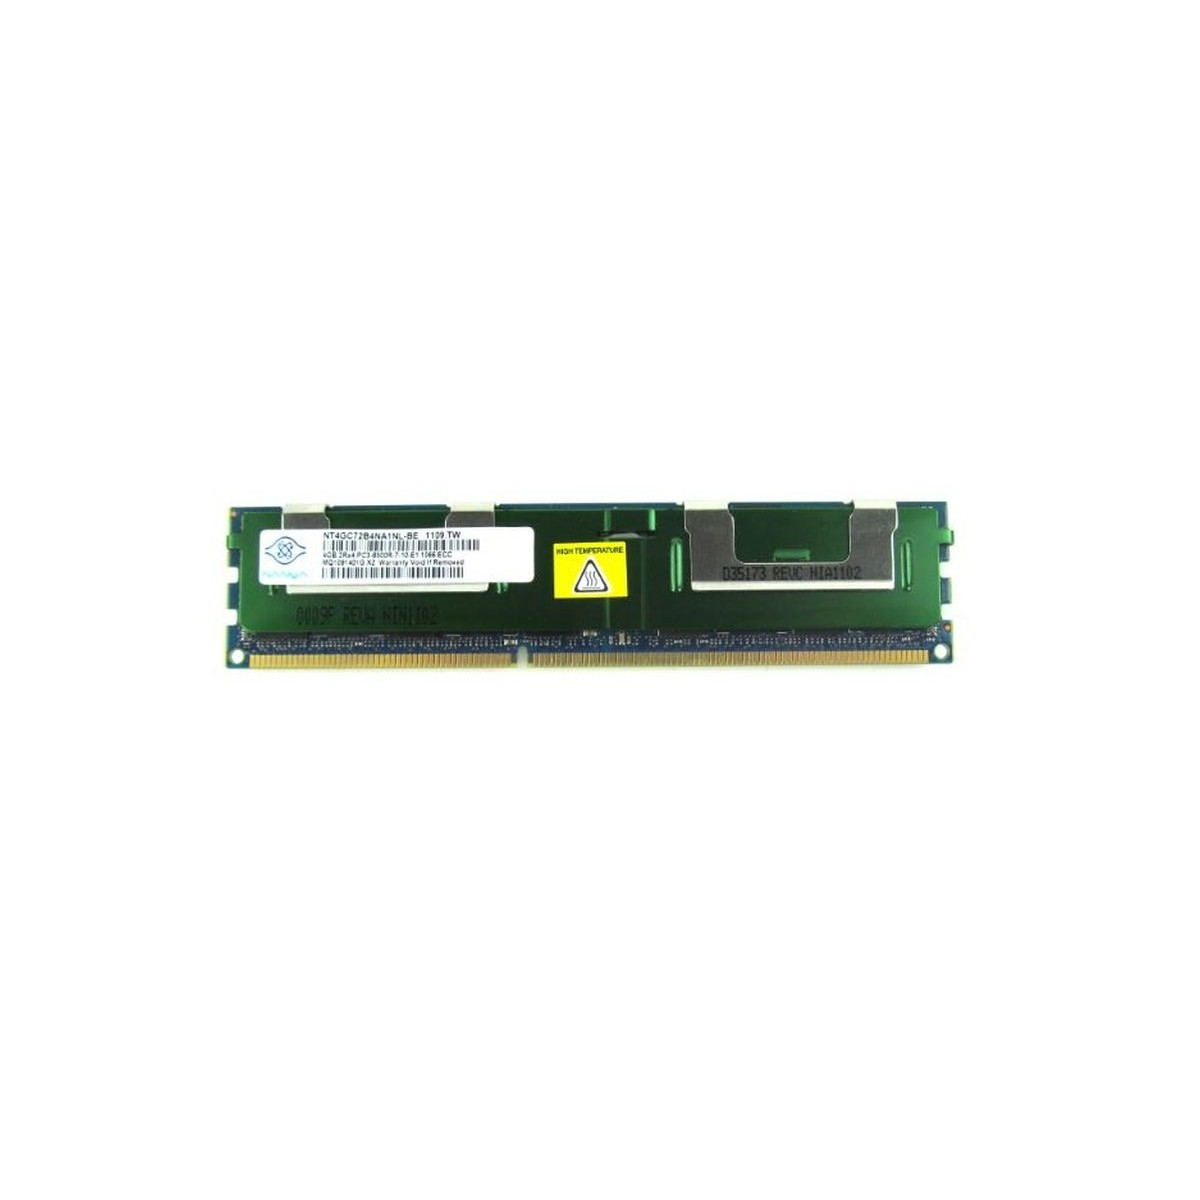 HP LSI SAS9207-8e H221 H3-25280-01 FULL 660087-001